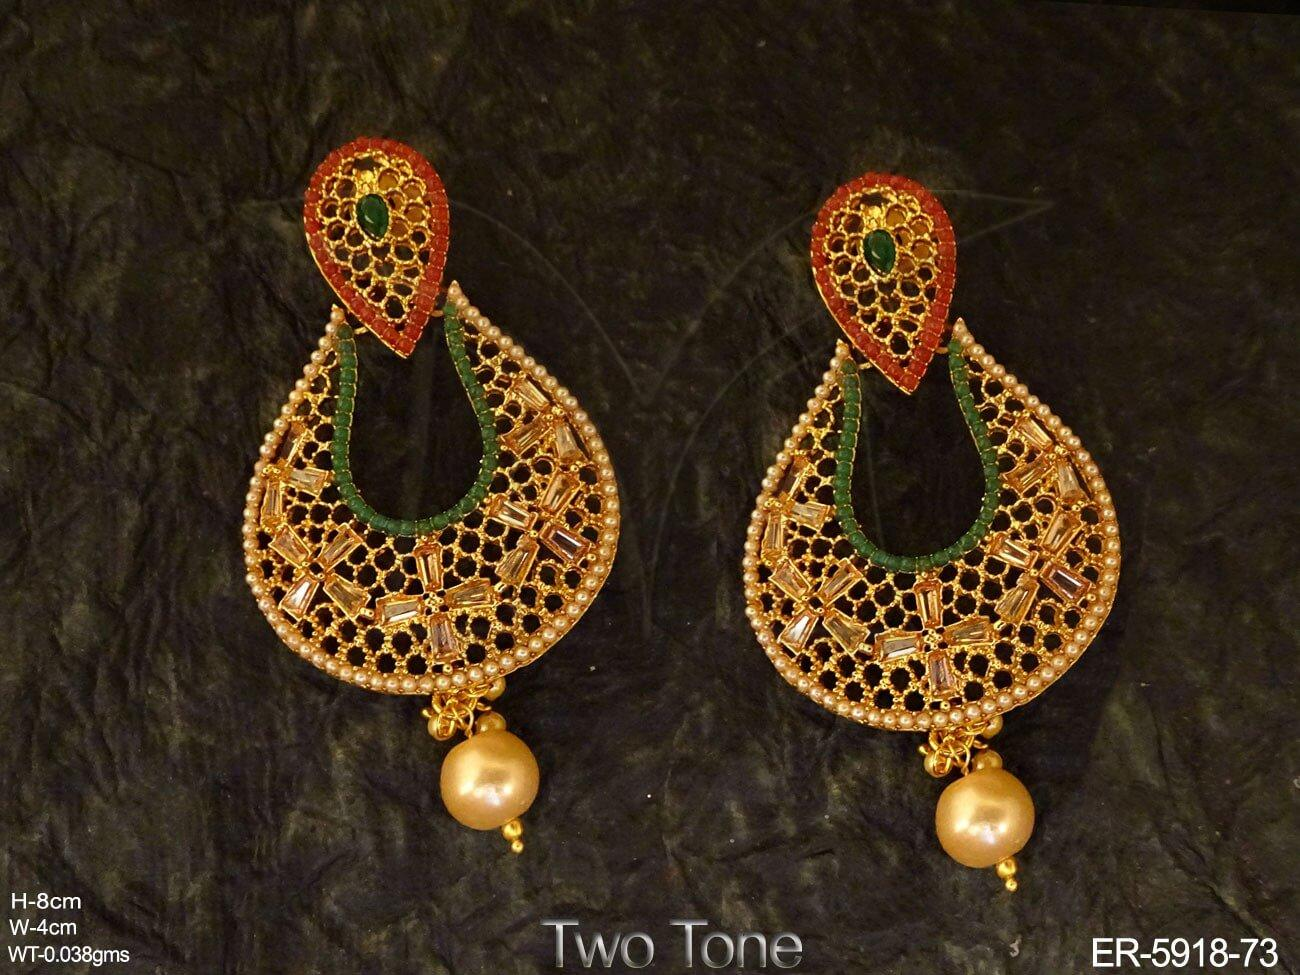 Antique Style Chandbali Earrings